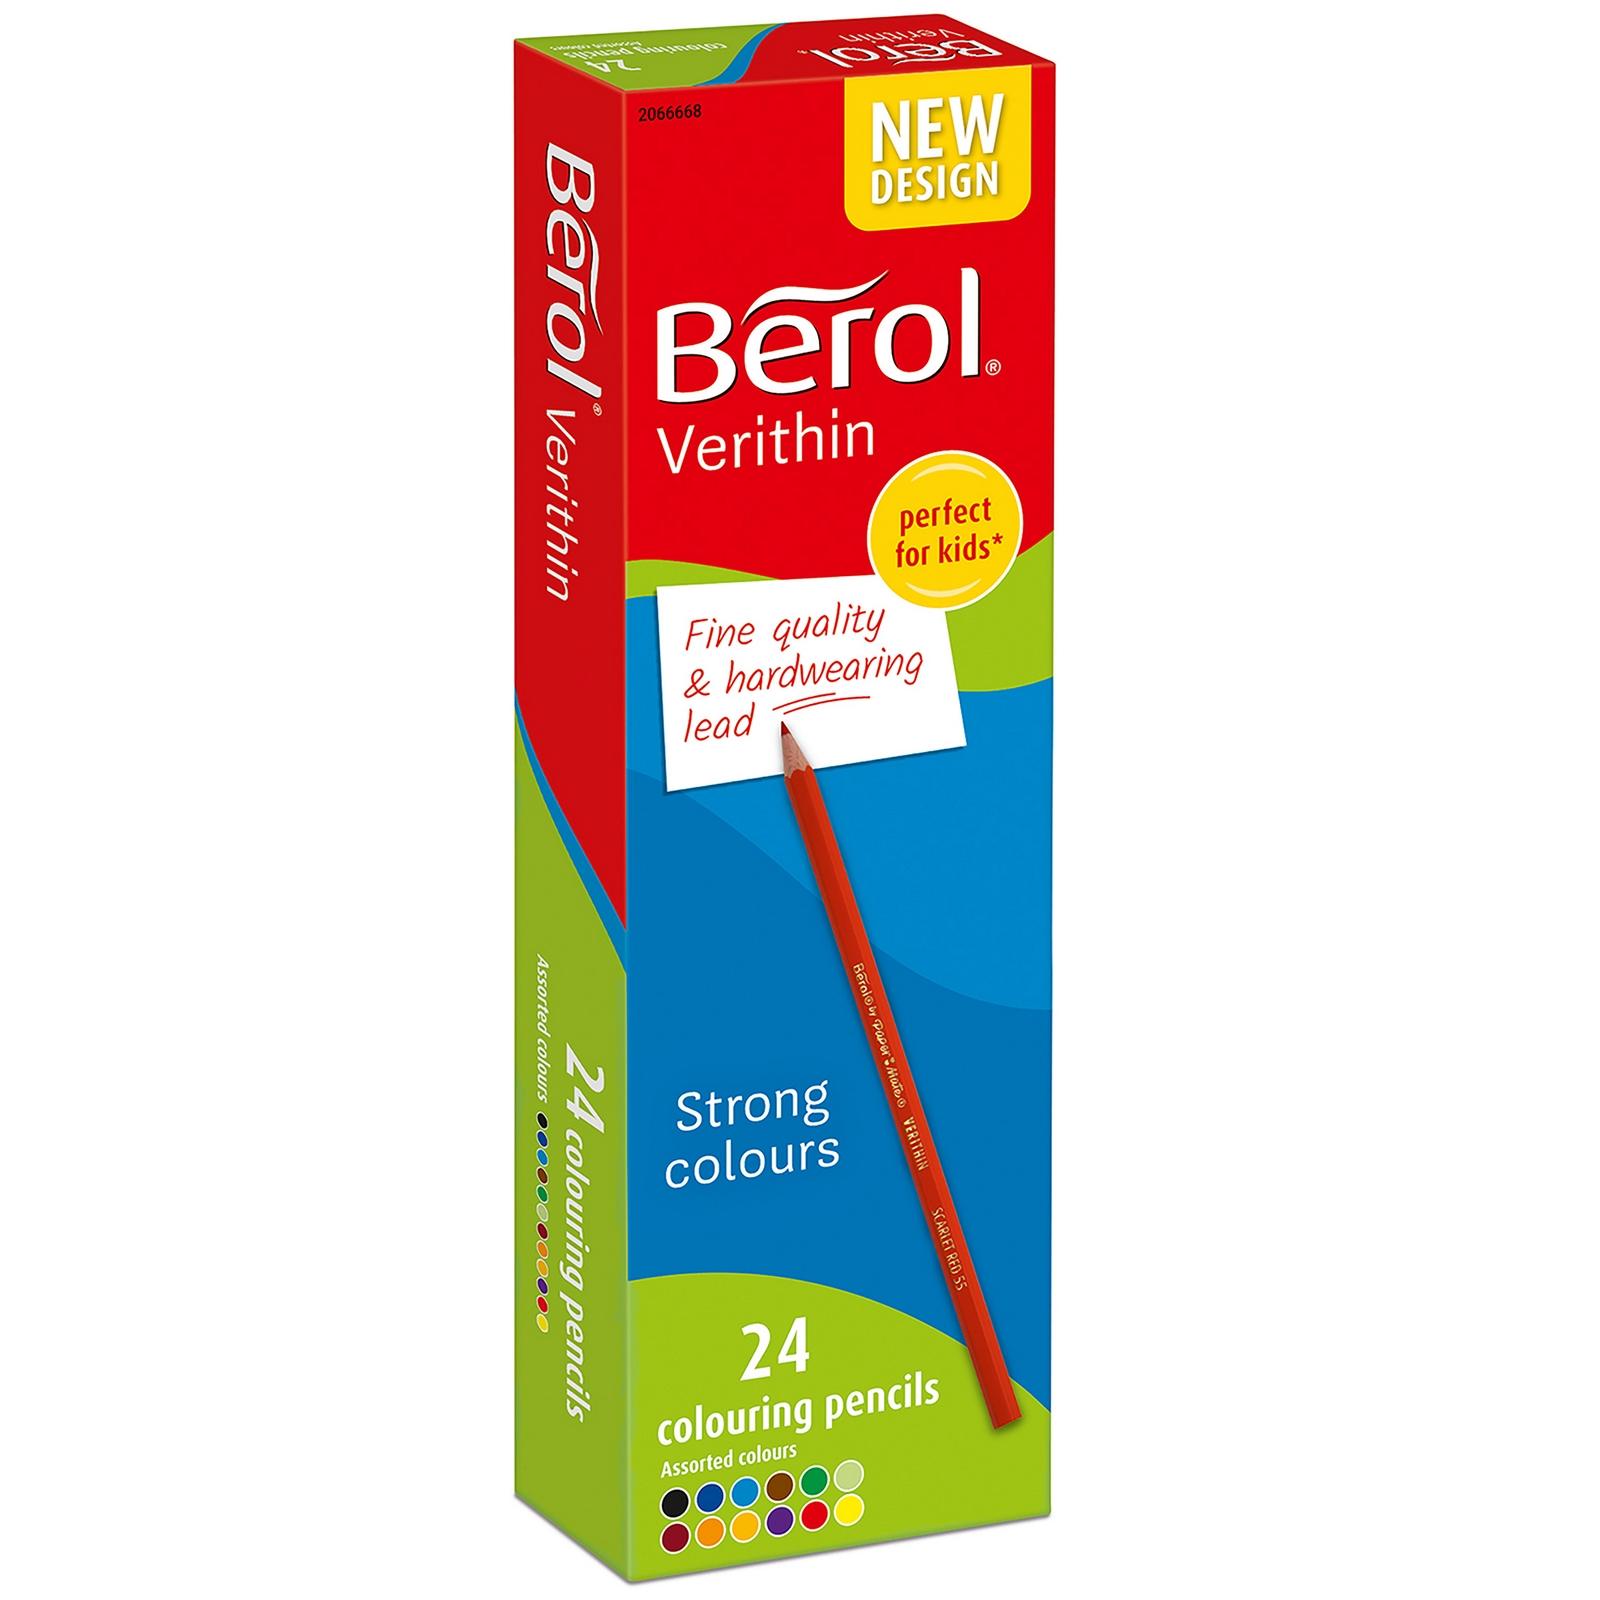 Berol Verithin Pencils Pack 144